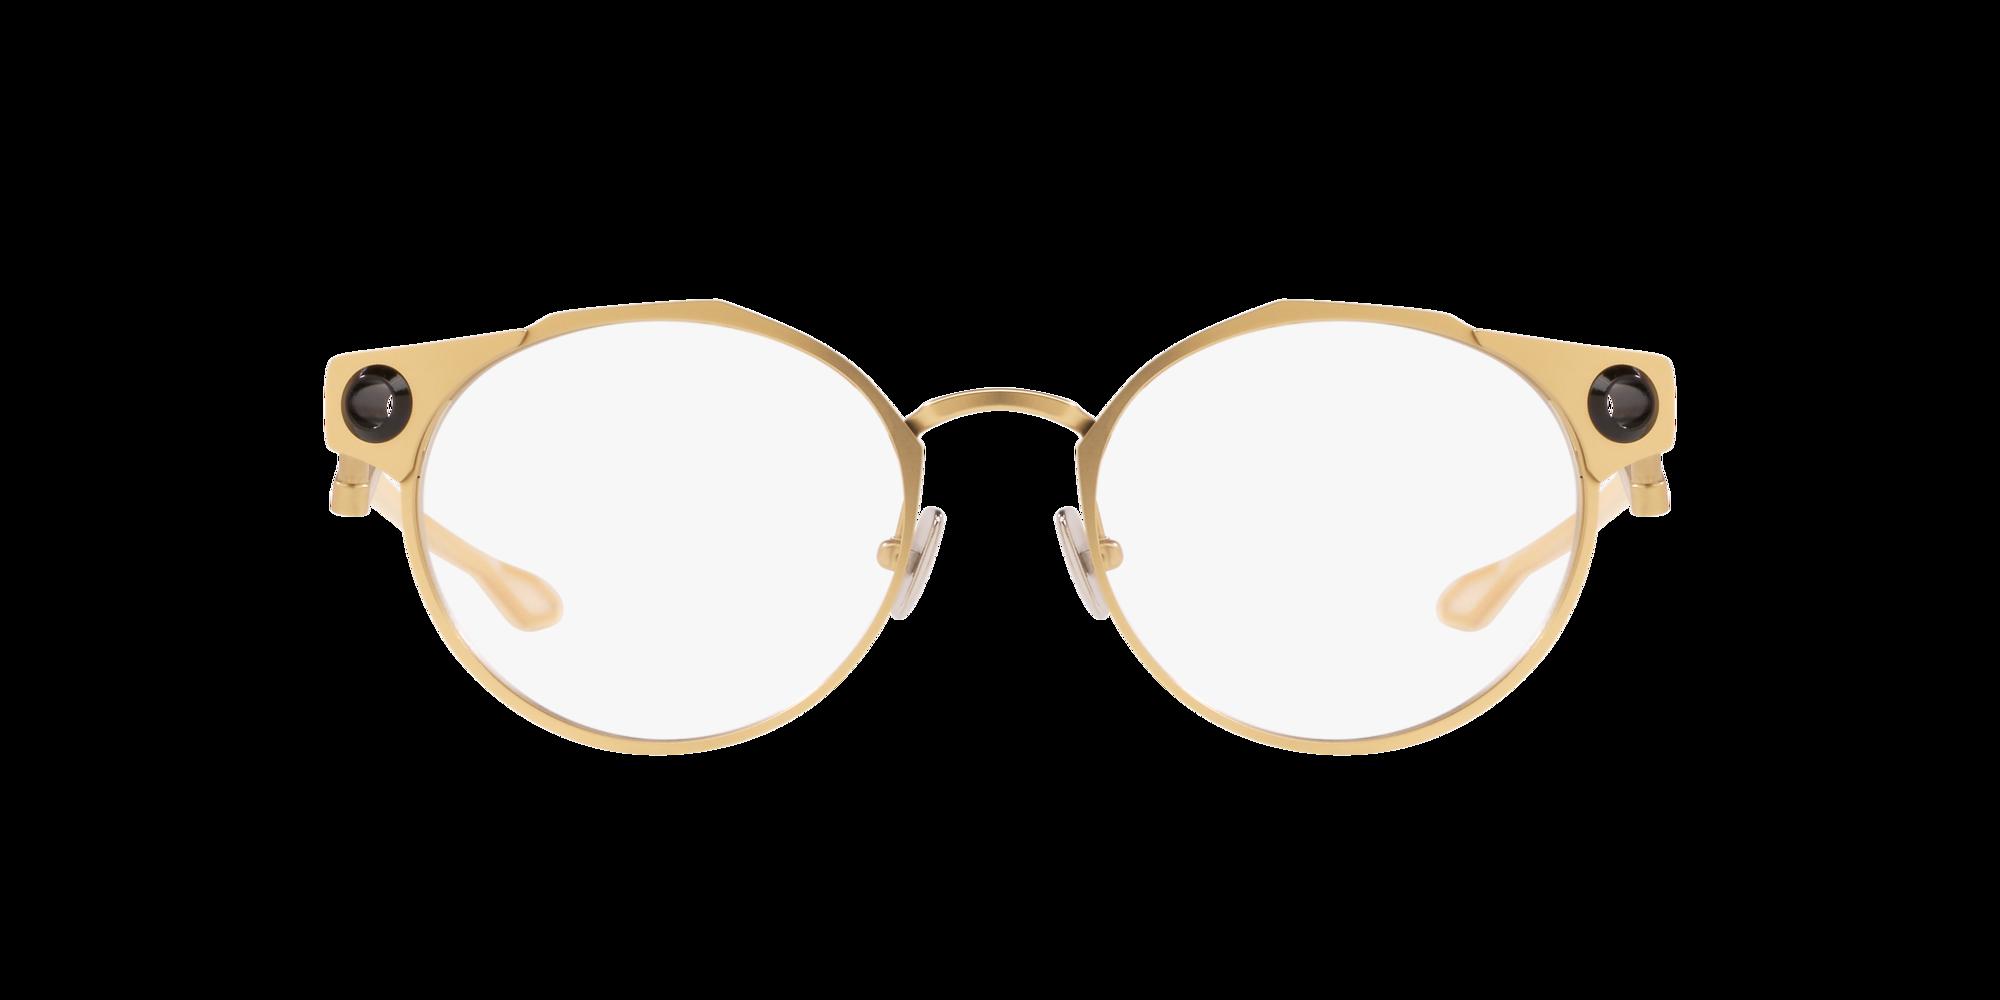 Image for OX5141 DEADBOLT from LensCrafters | Glasses, Prescription Glasses Online, Eyewear